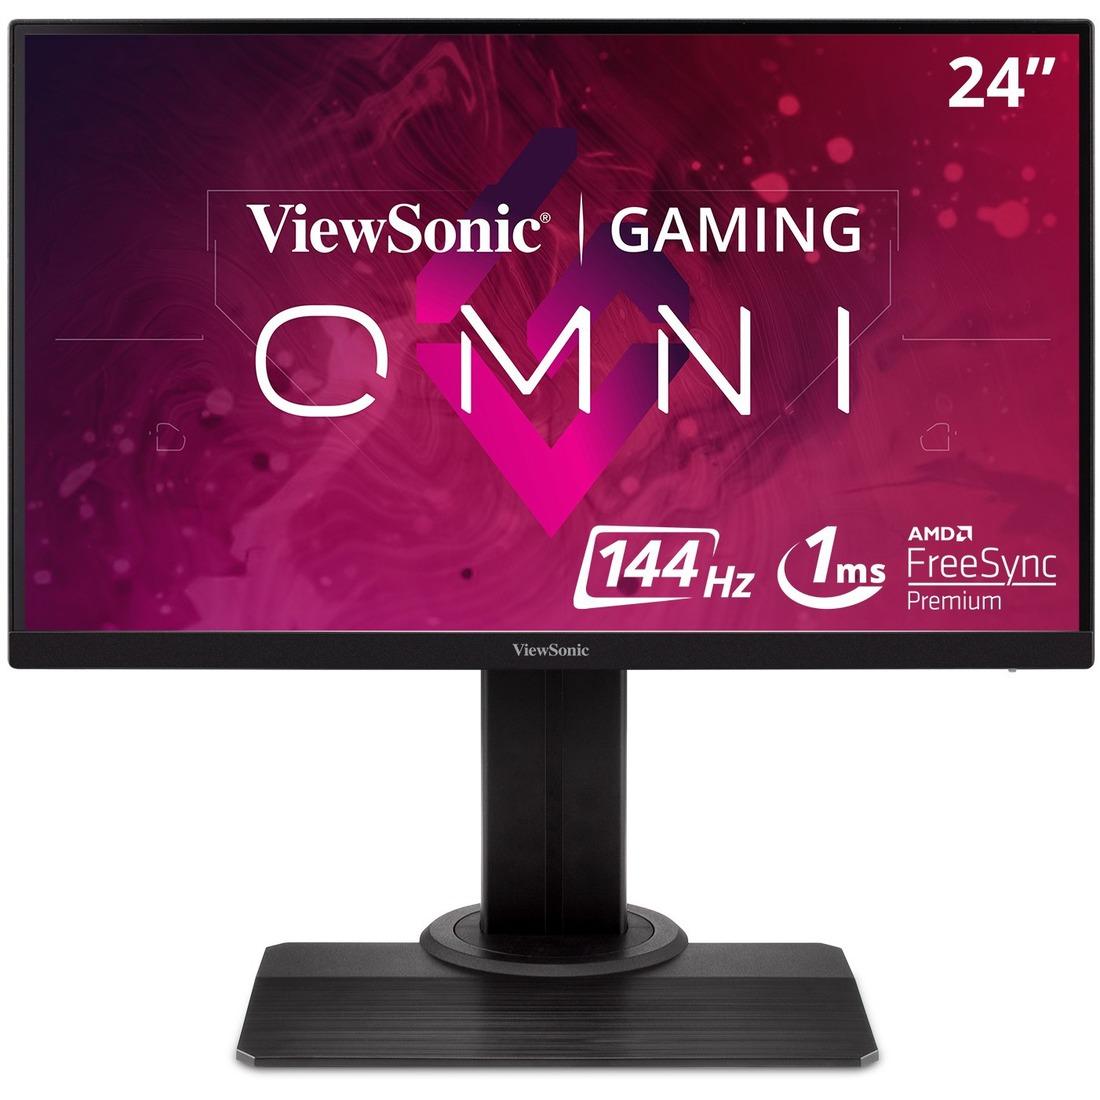 "Viewsonic XG2405 23.8"" Full HD LED Gaming LCD Monitor - 16:9_subImage_1"